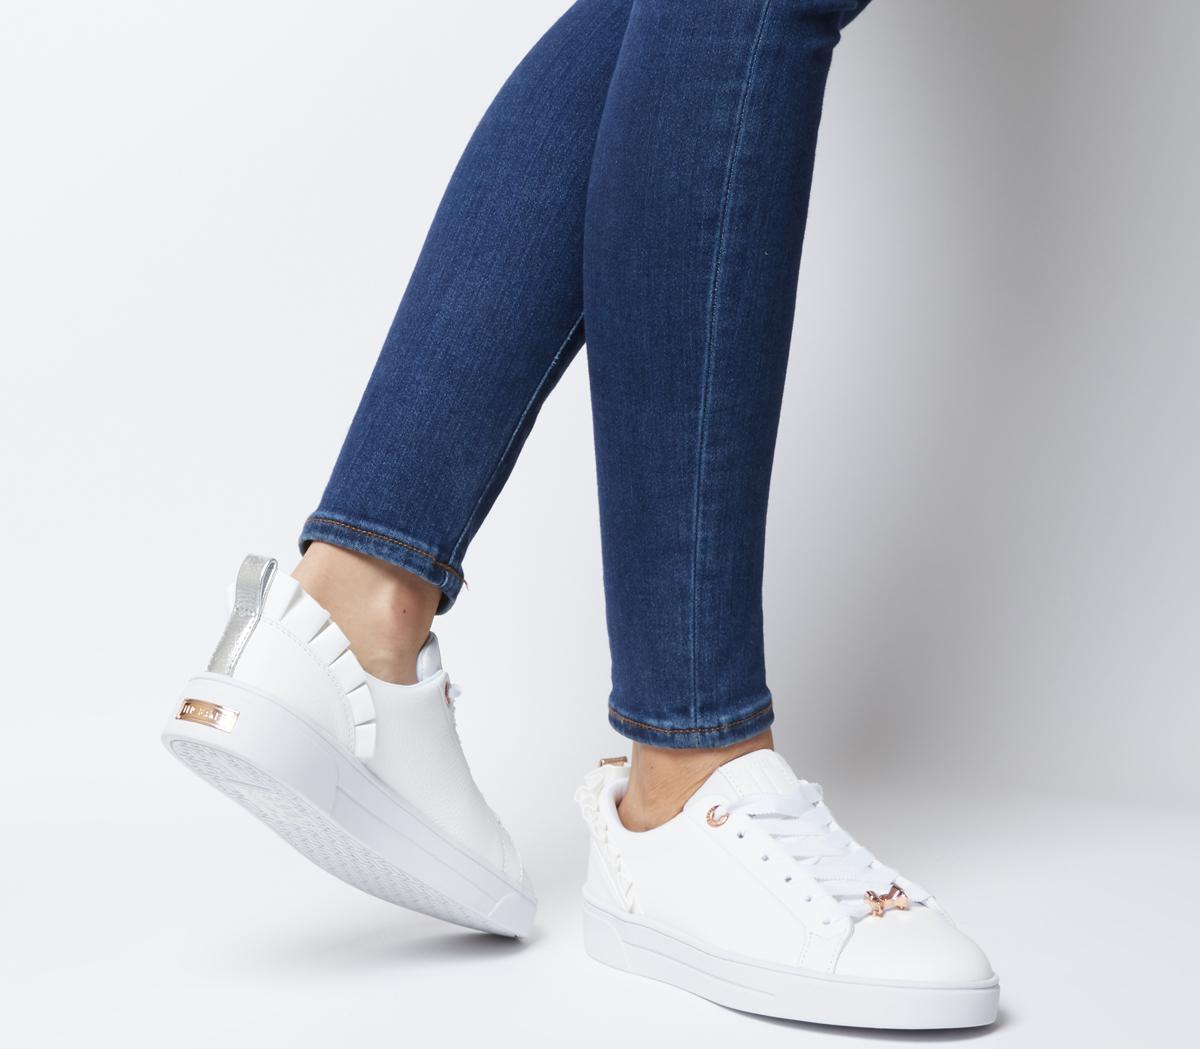 Ted Baker Astrina Sneakers White